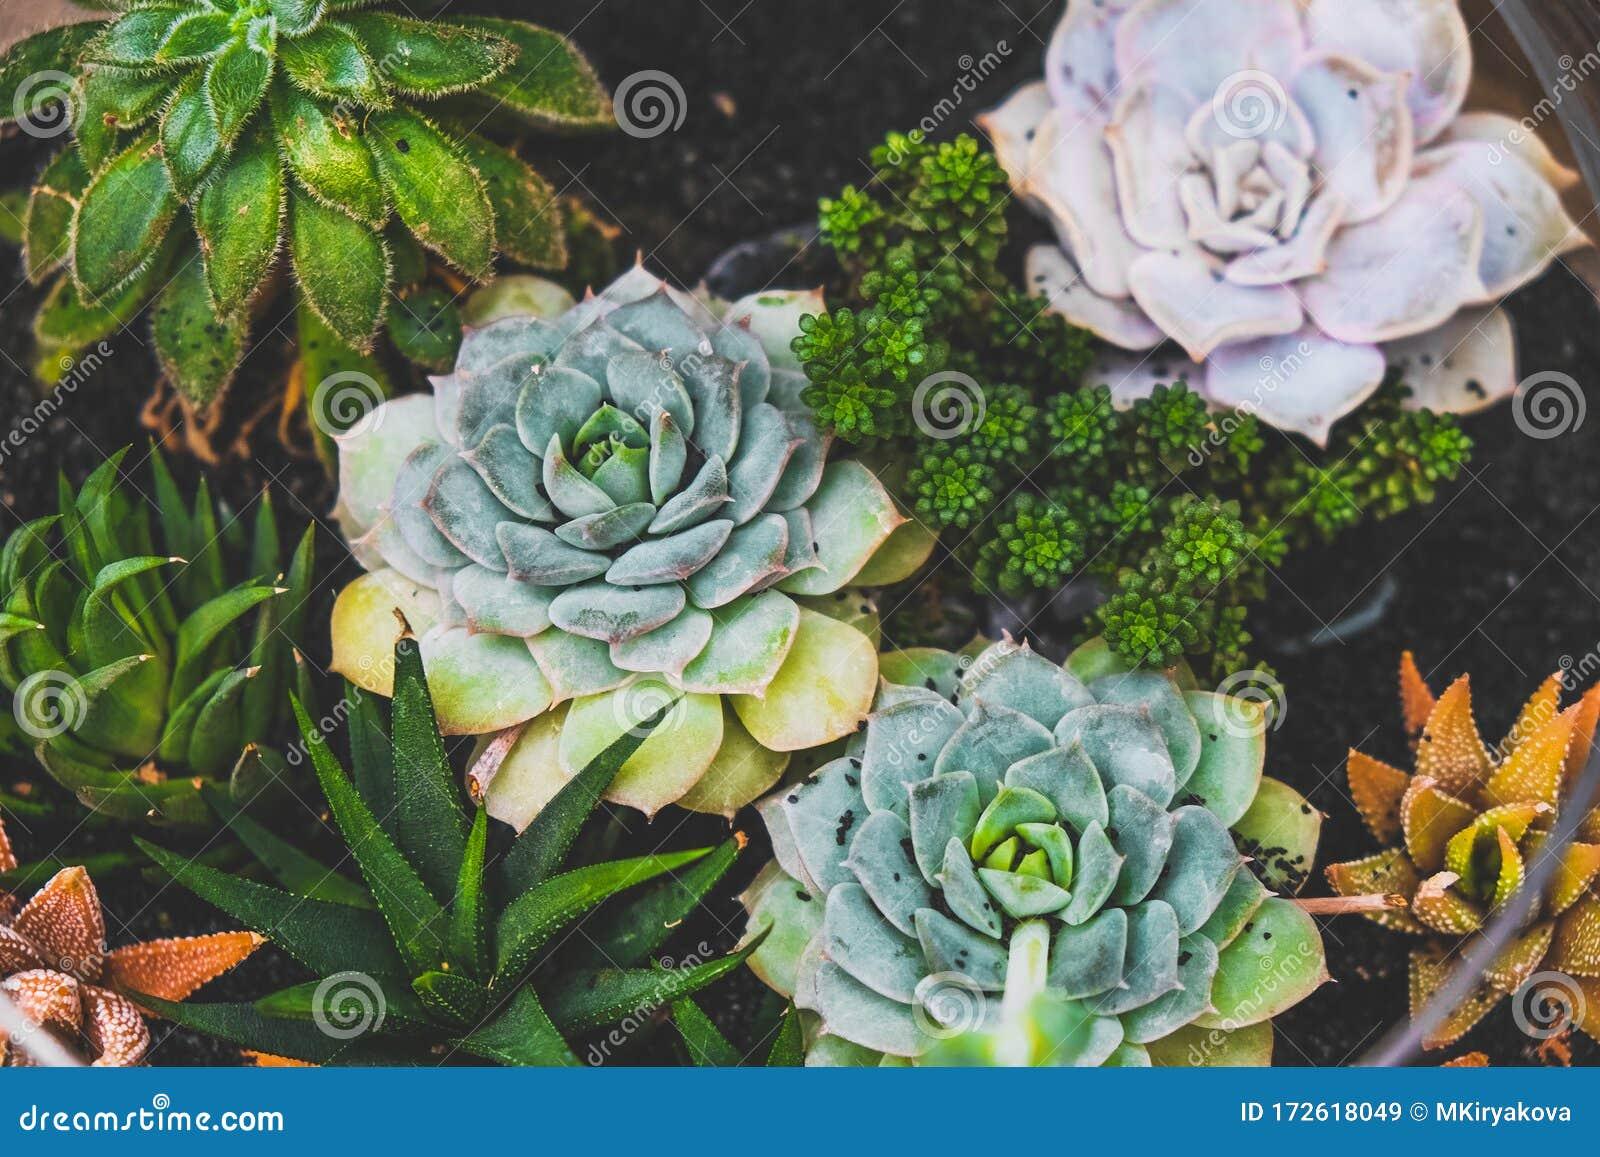 Colourful Succulent Plants In Pot Houseplants Stock Image